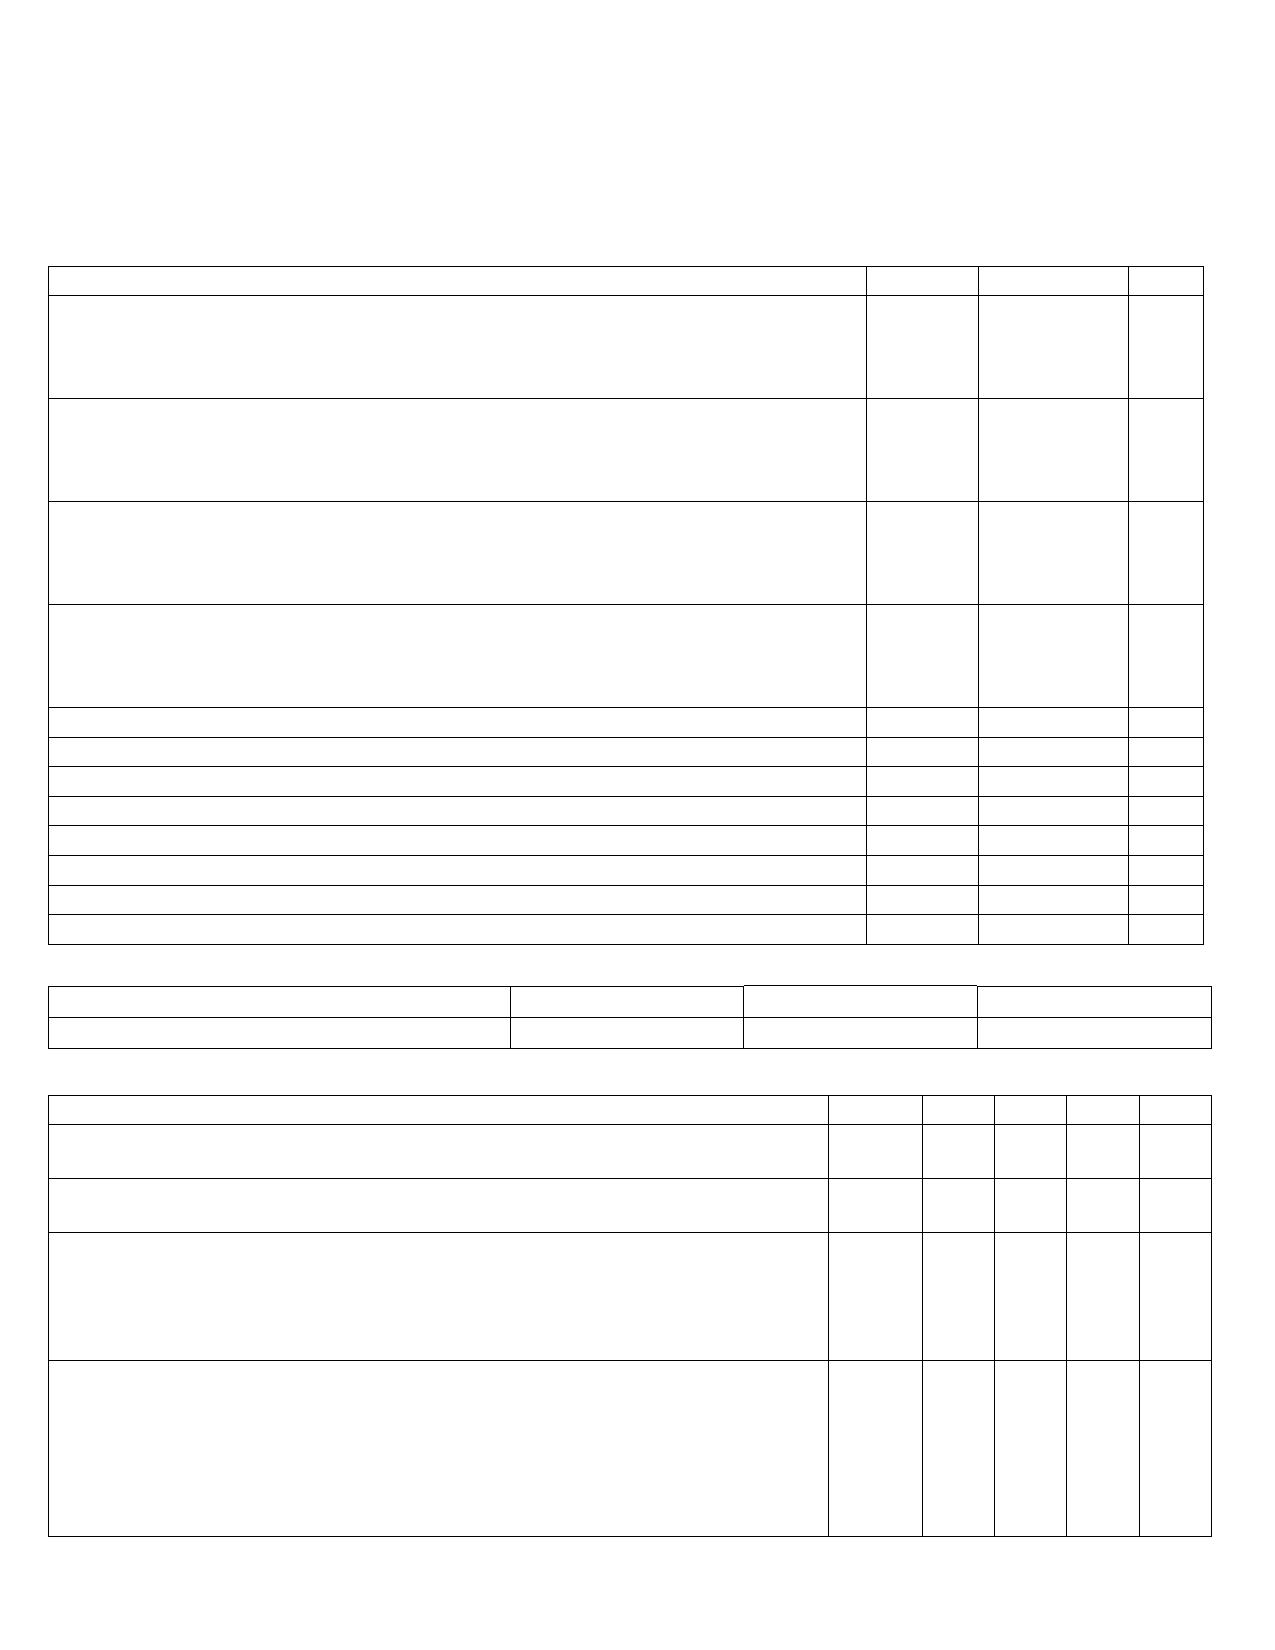 BT162-400 Datasheet, BT162-400 PDF,ピン配置, 機能